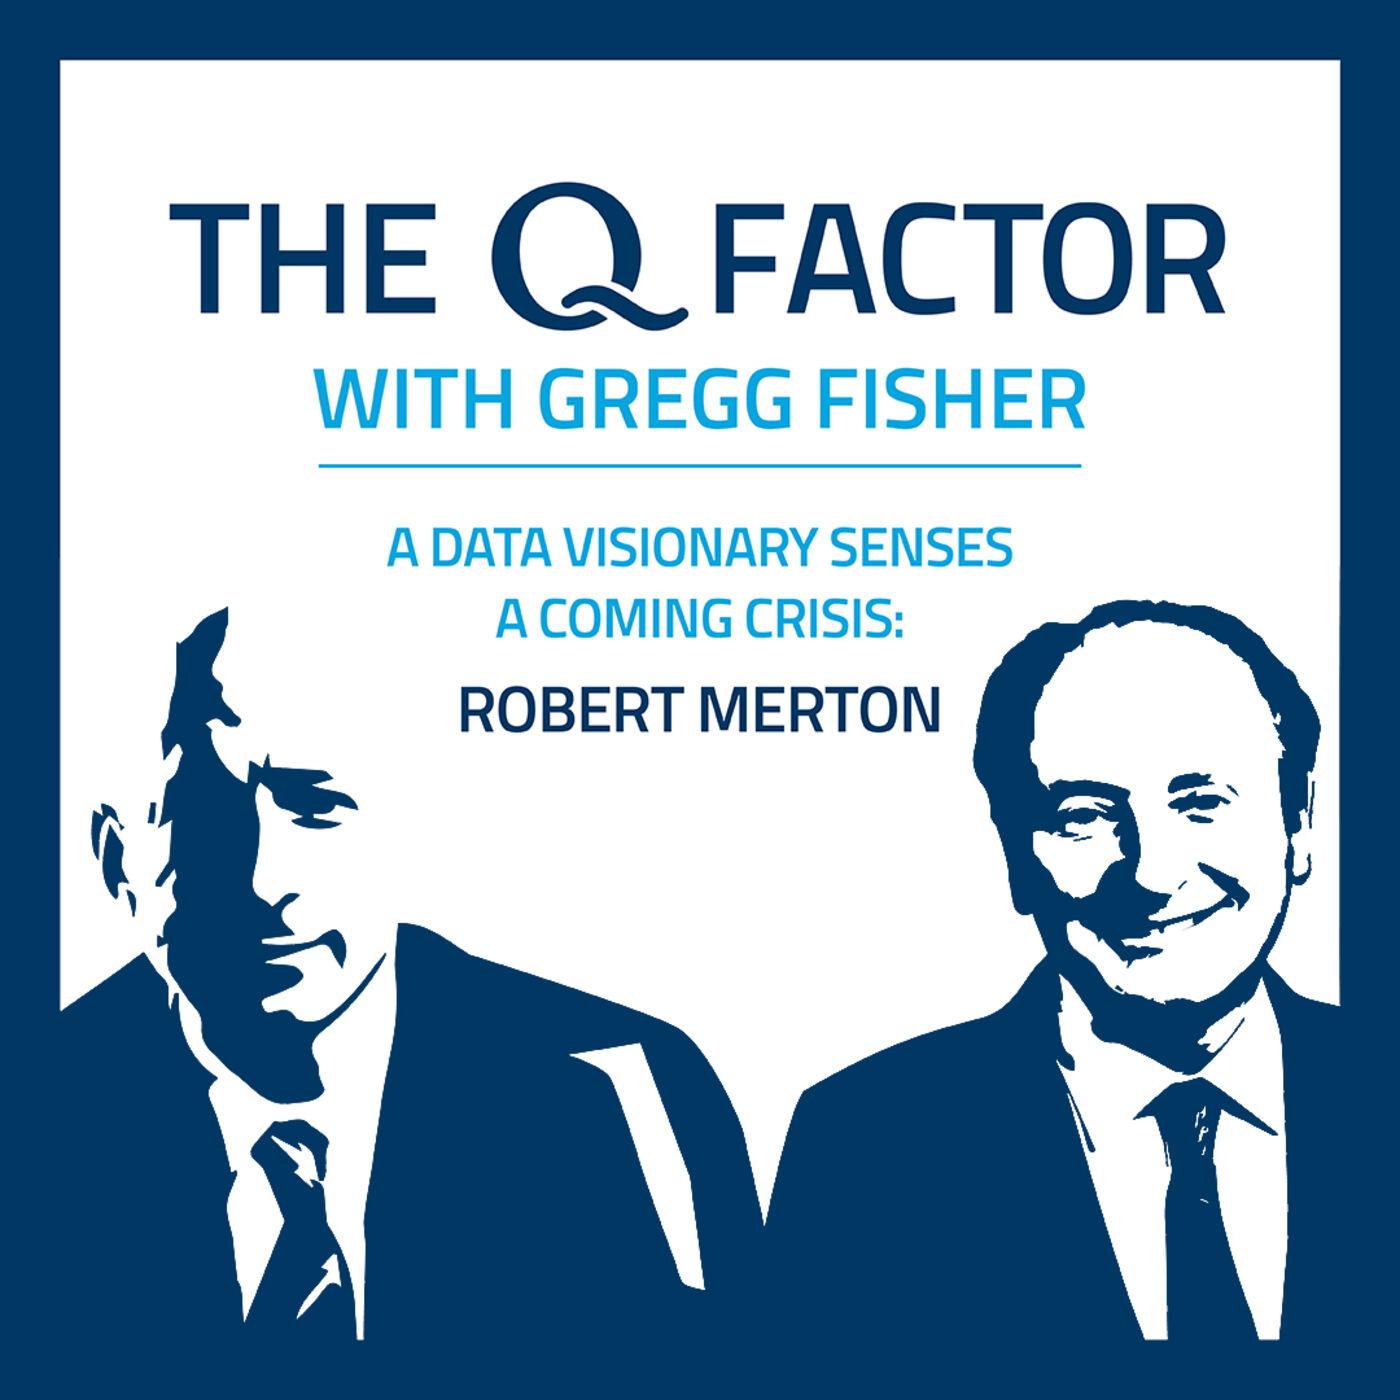 Robert Merton: A Data Visionary Senses A Coming Crisis